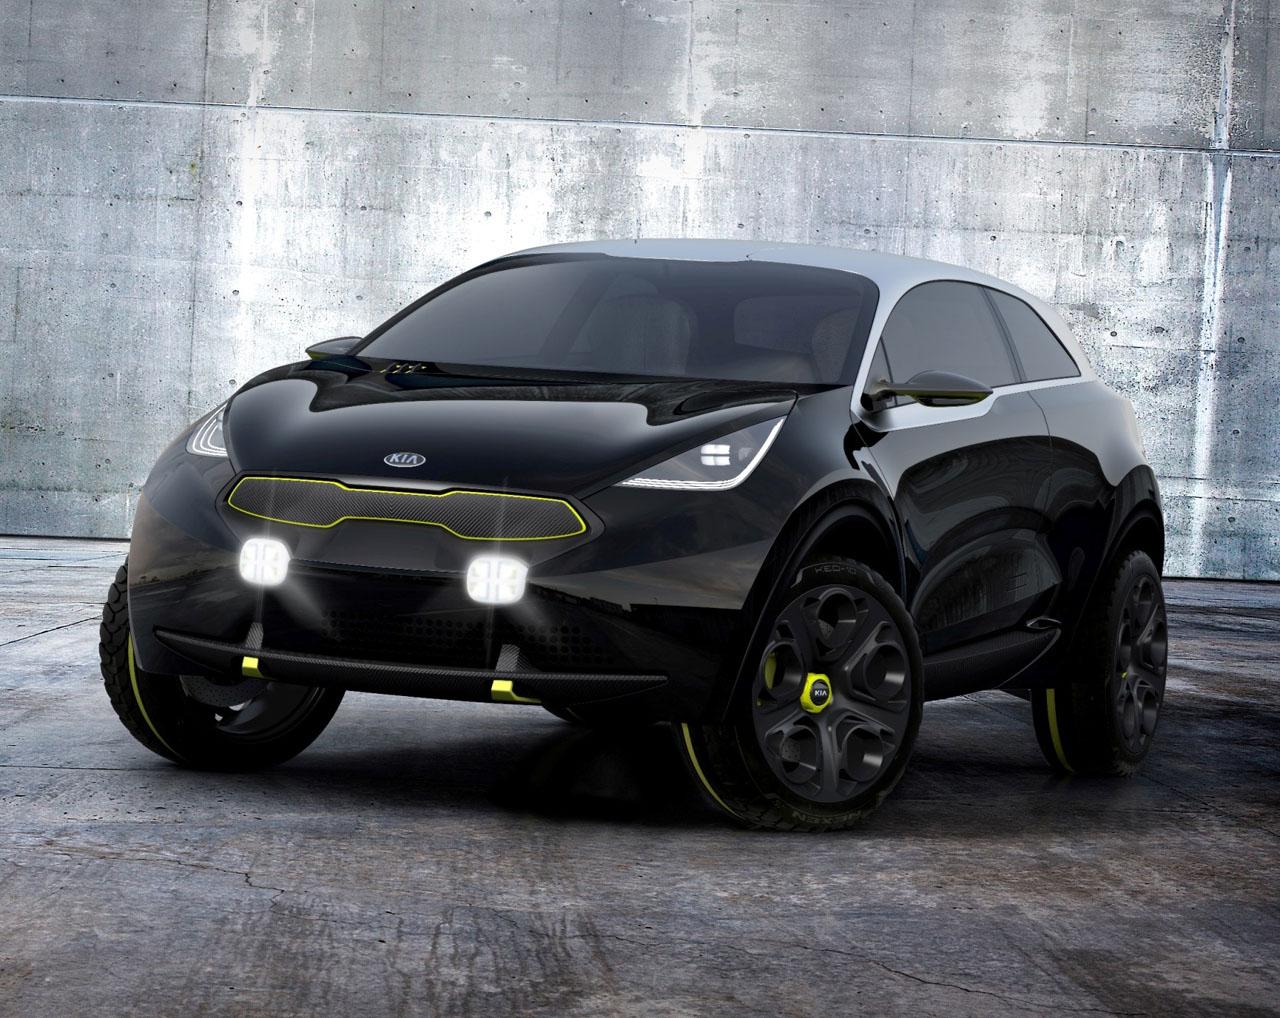 Cool Kia Niro Concept Makes North American Debut CarCostCanada - Cool kia cars